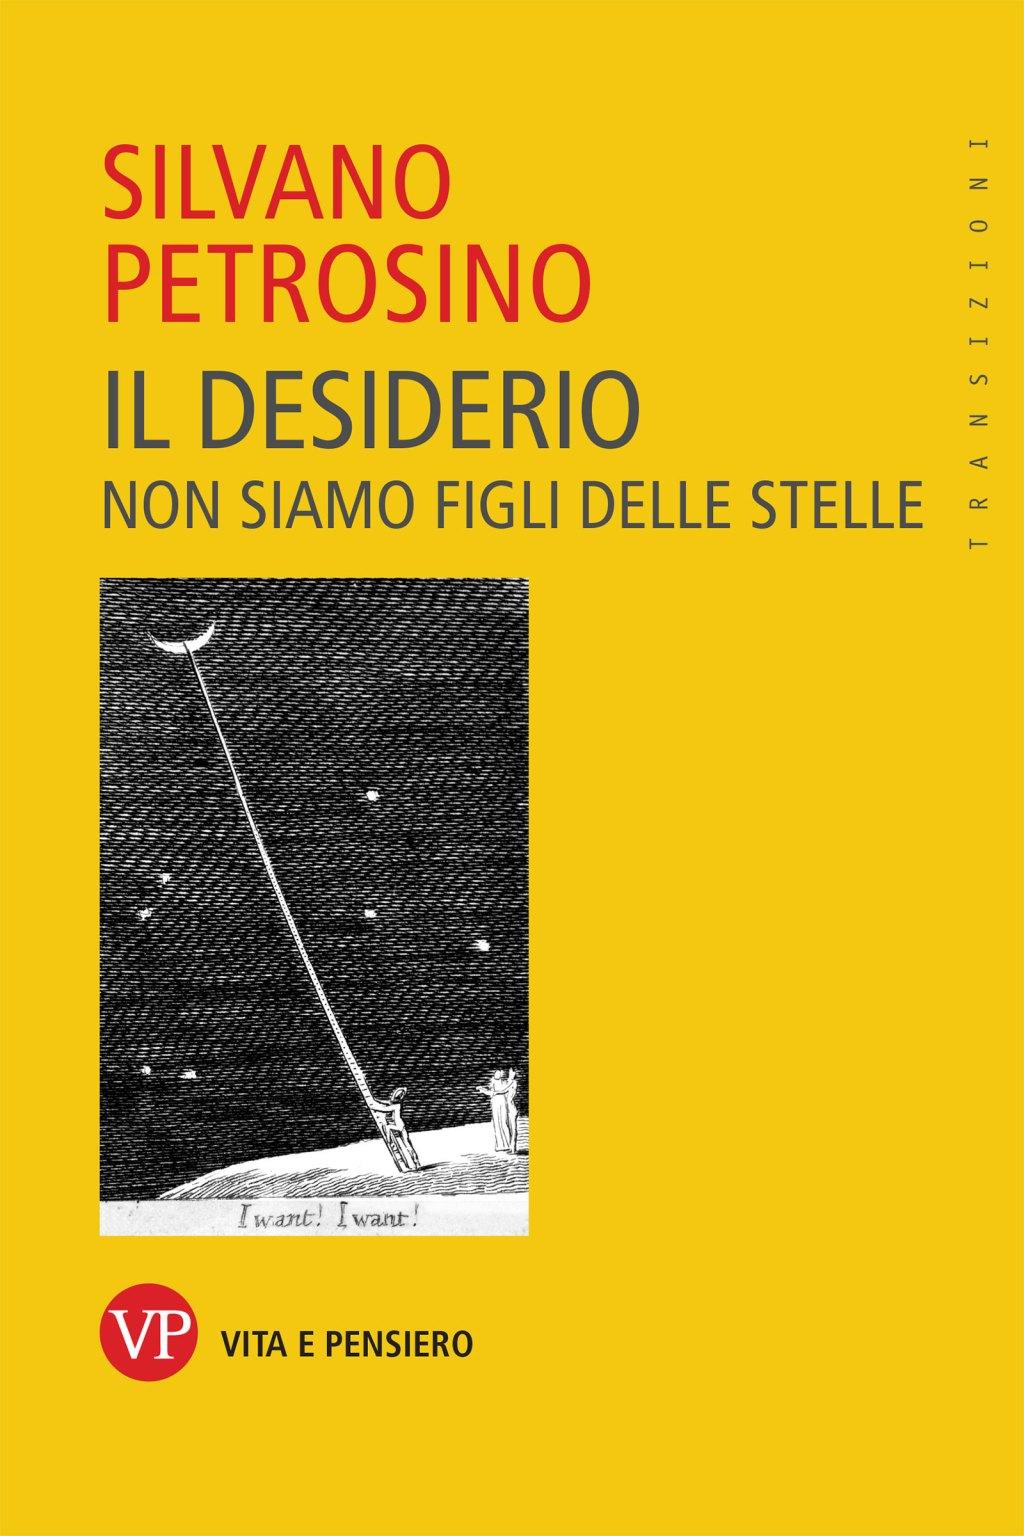 Silvano Petrosino